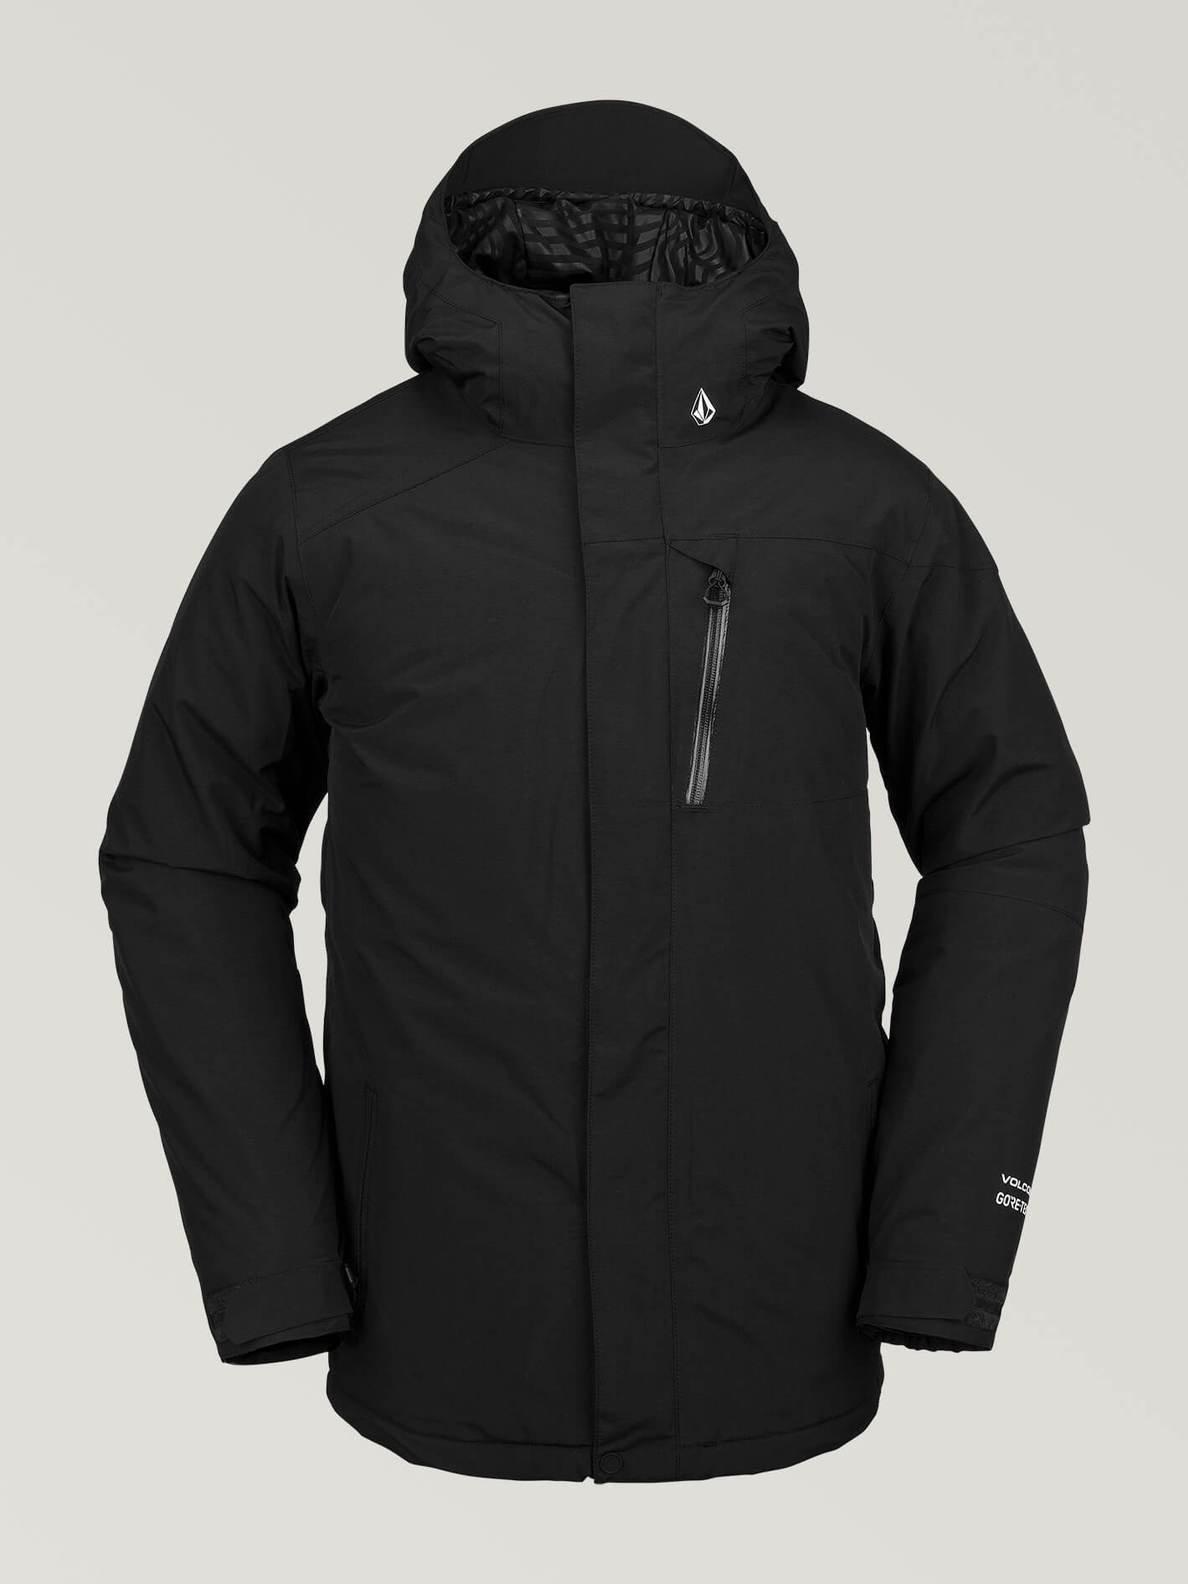 Volcom L Gore Jacket (Multiple Color Options)